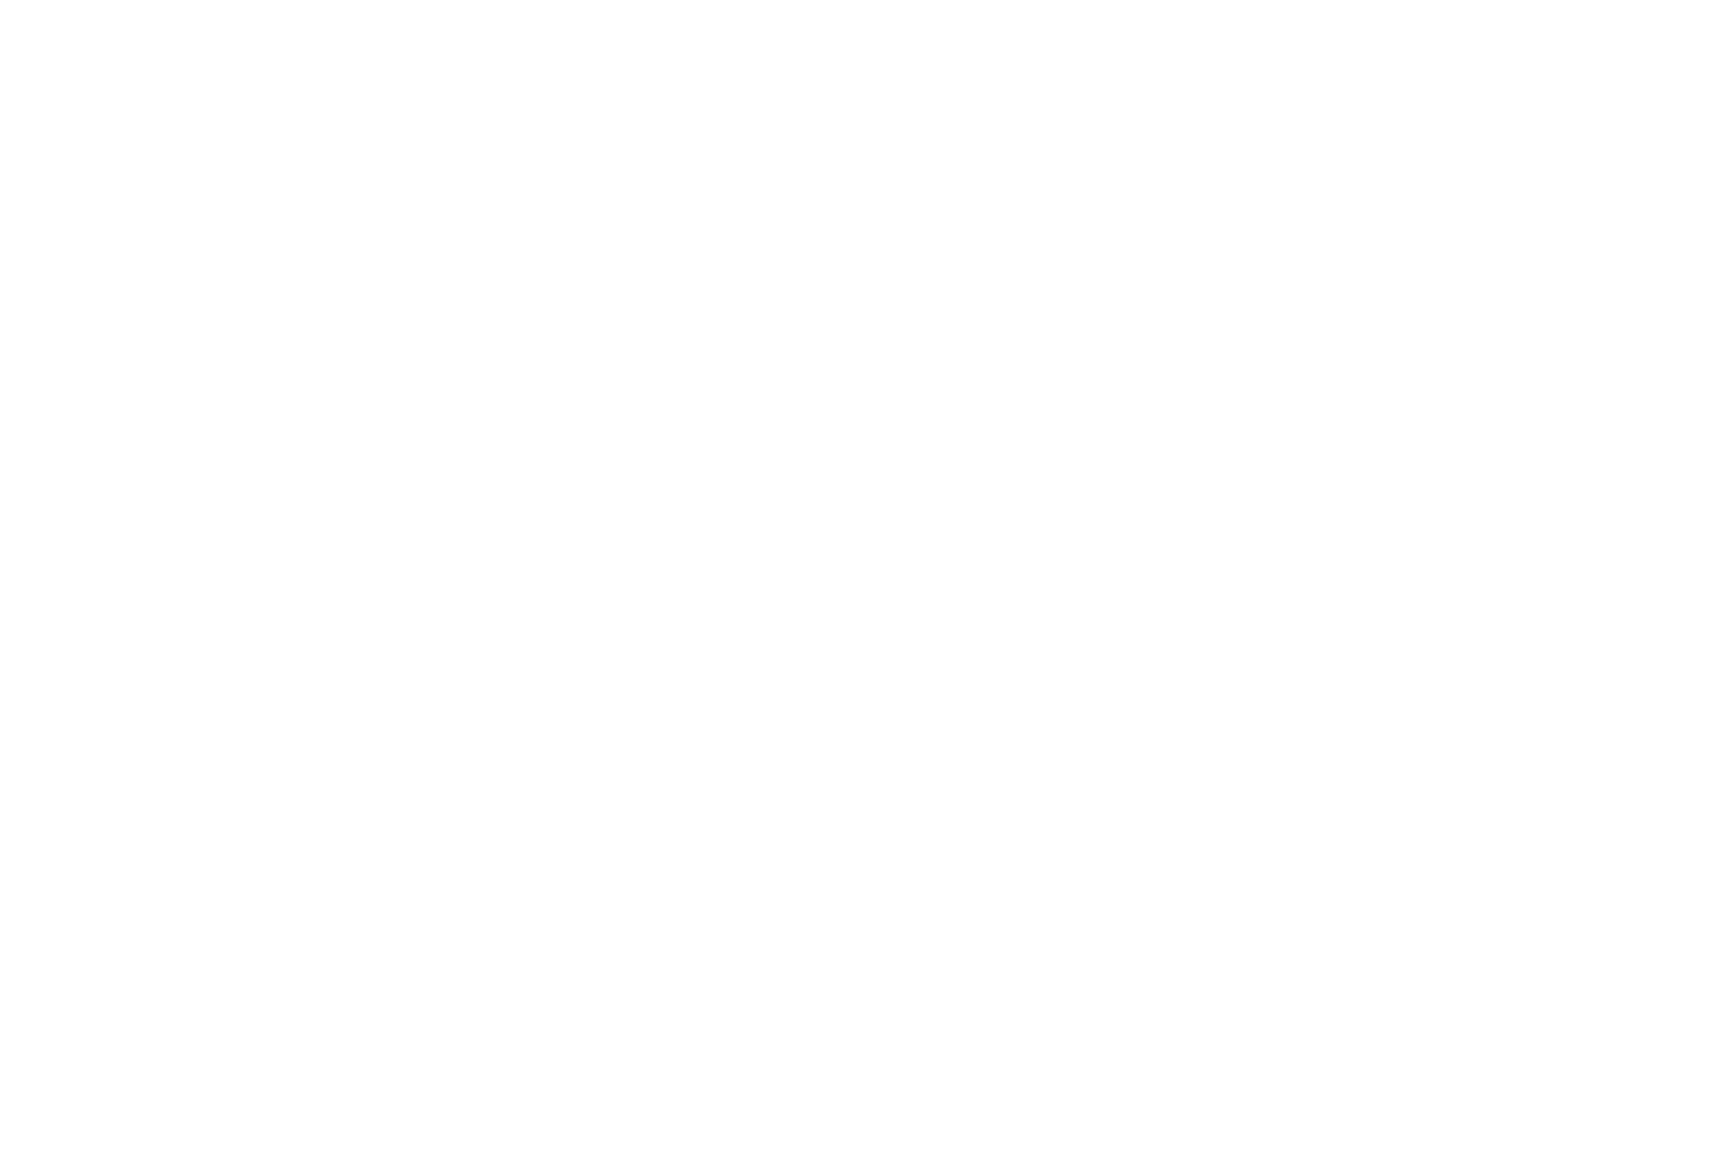 OFFICIAL SELECTION - Salem Short Film Festival - 2016